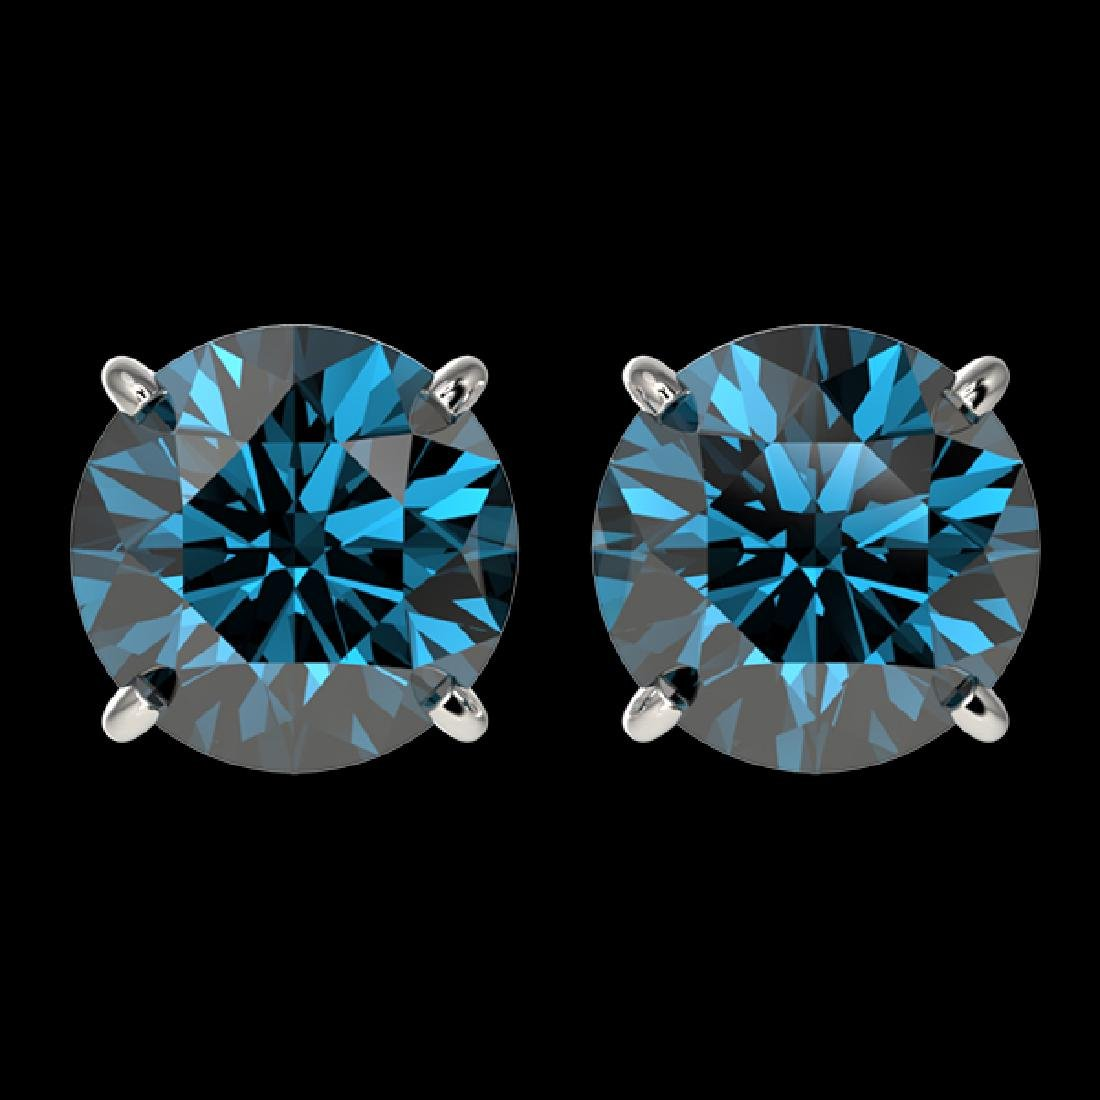 3 CTW Certified Intense Blue SI Diamond Solitaire Stud